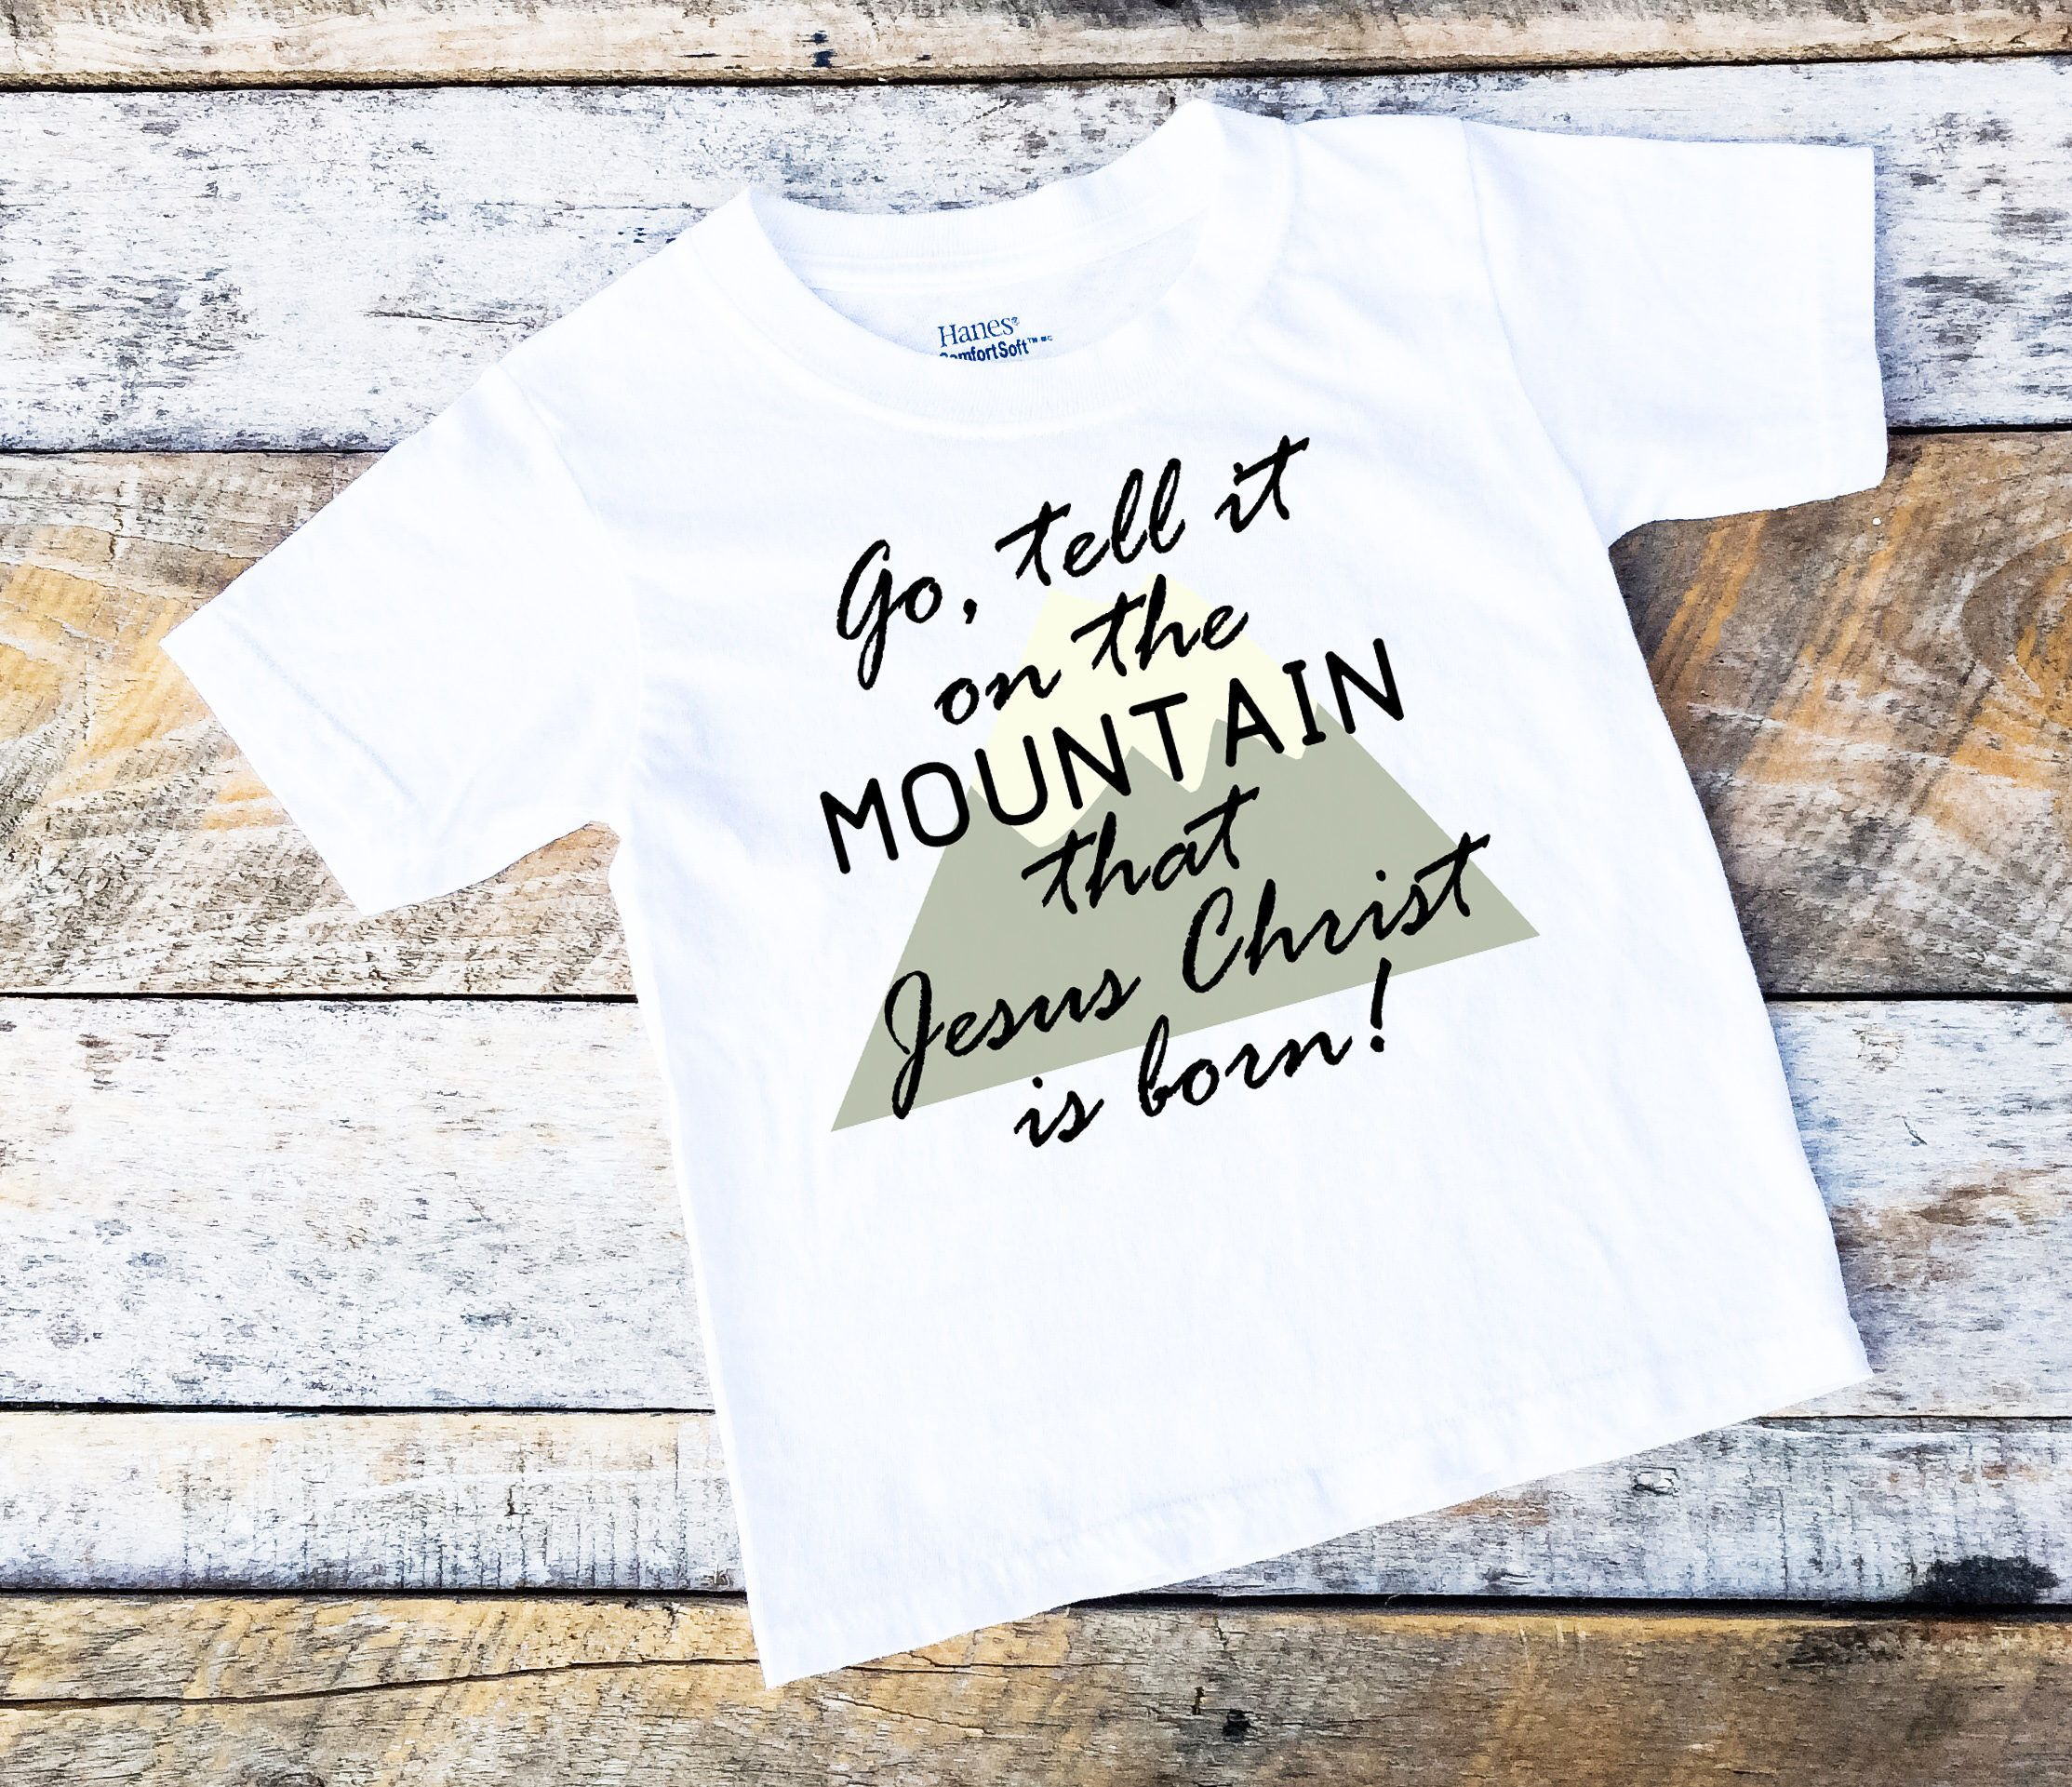 Christmas Onesies For Boys, Go Tell It On The Mountain